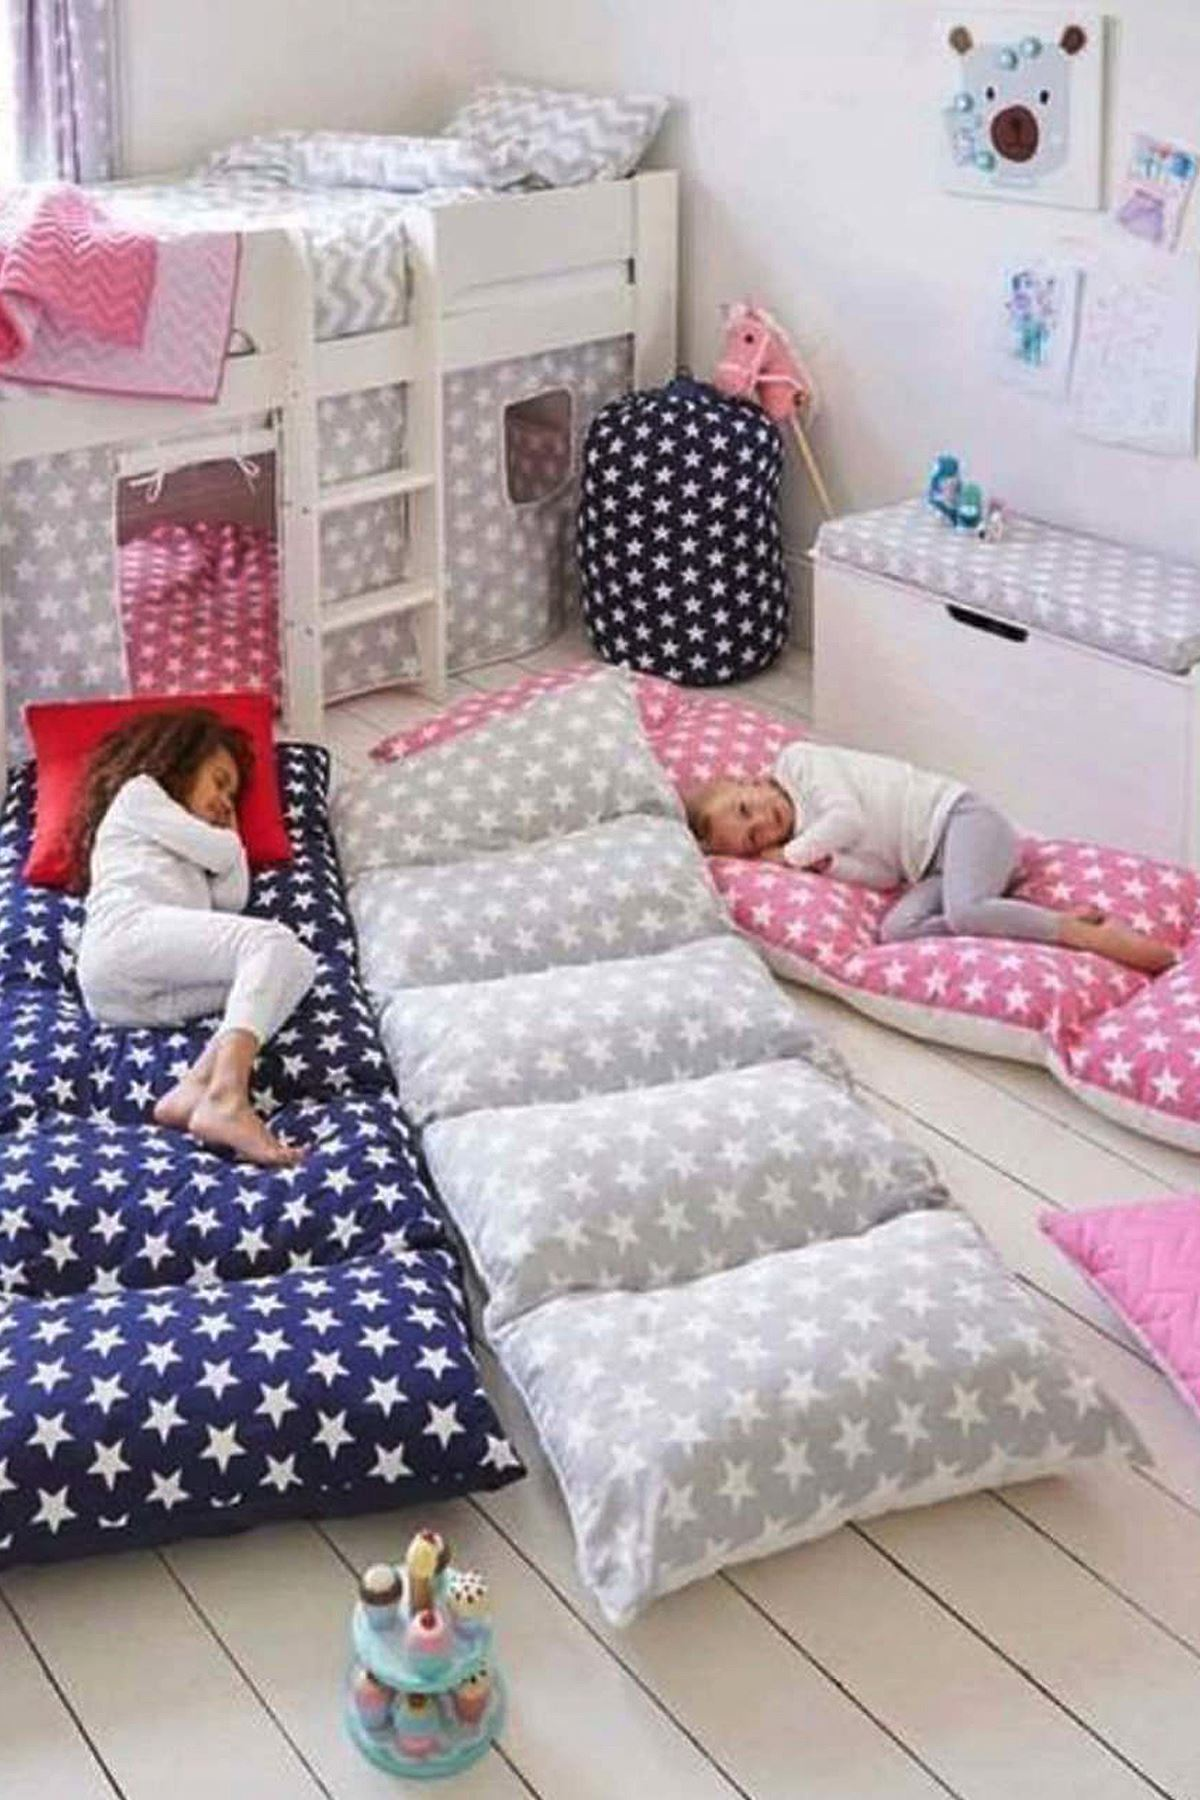 Yellow Bundera Pouf Foldable Floor Cushion Pillow Kids Baby Floor Bed